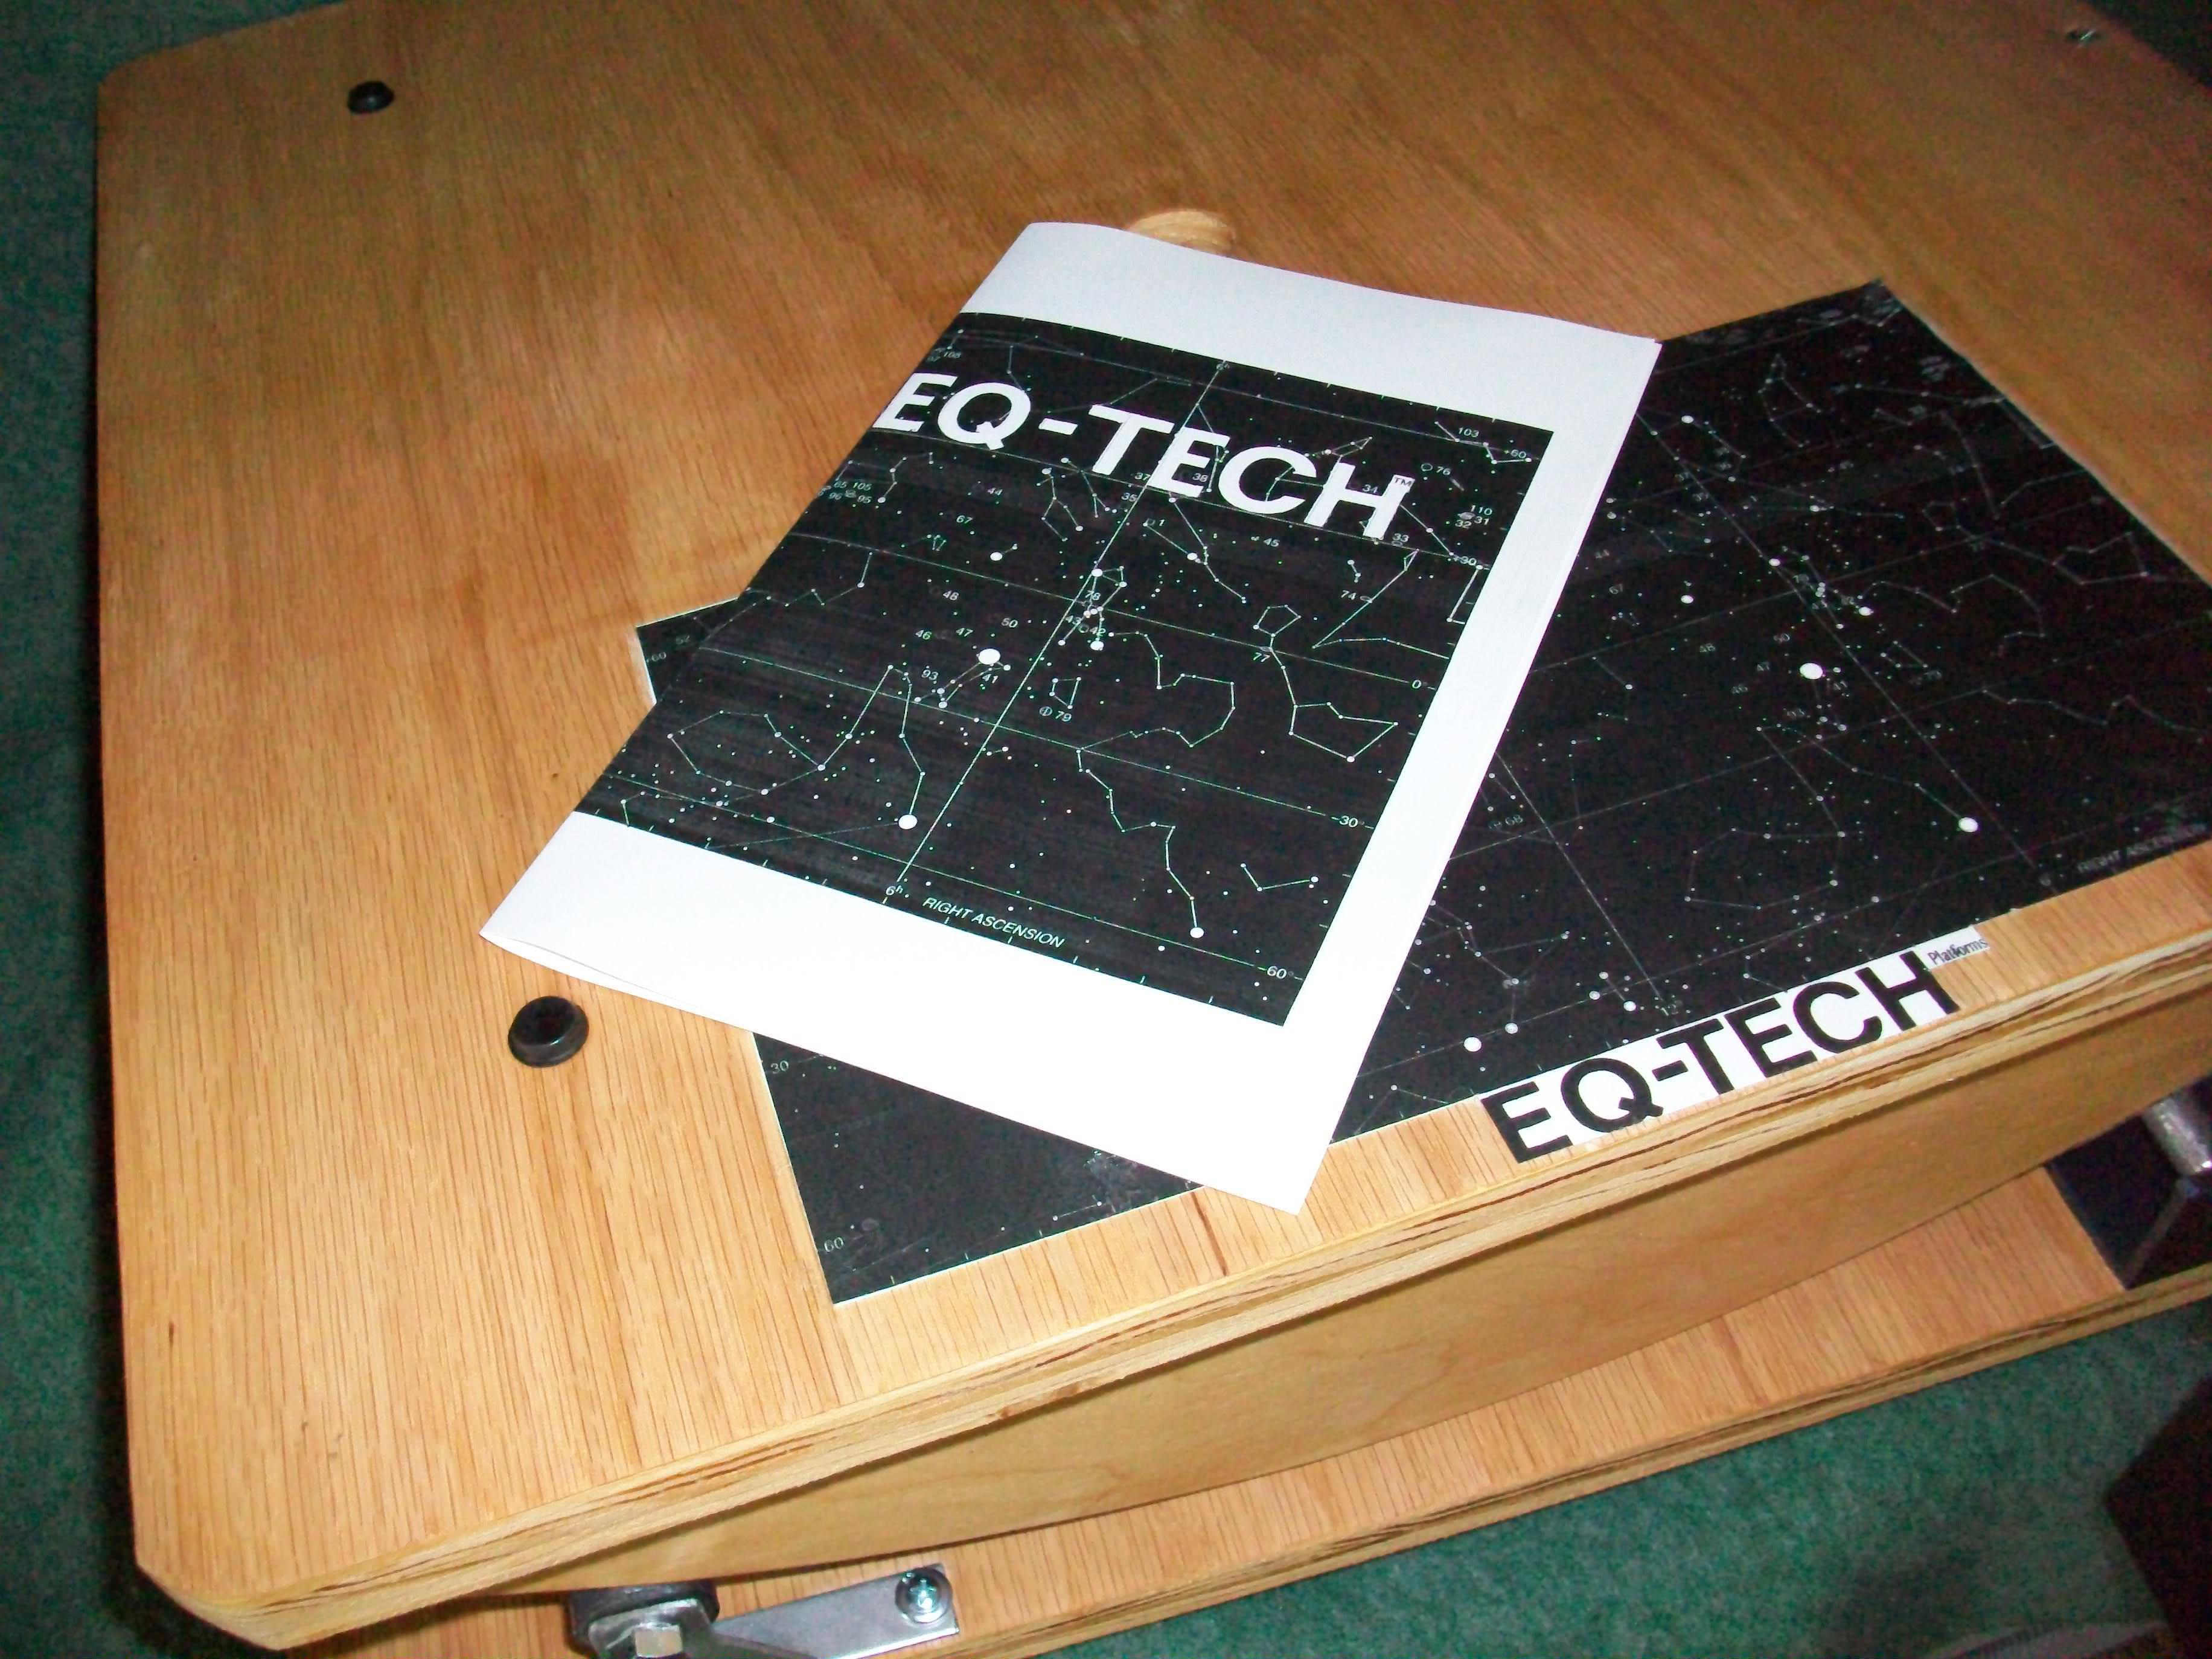 eq-tech paper info 001